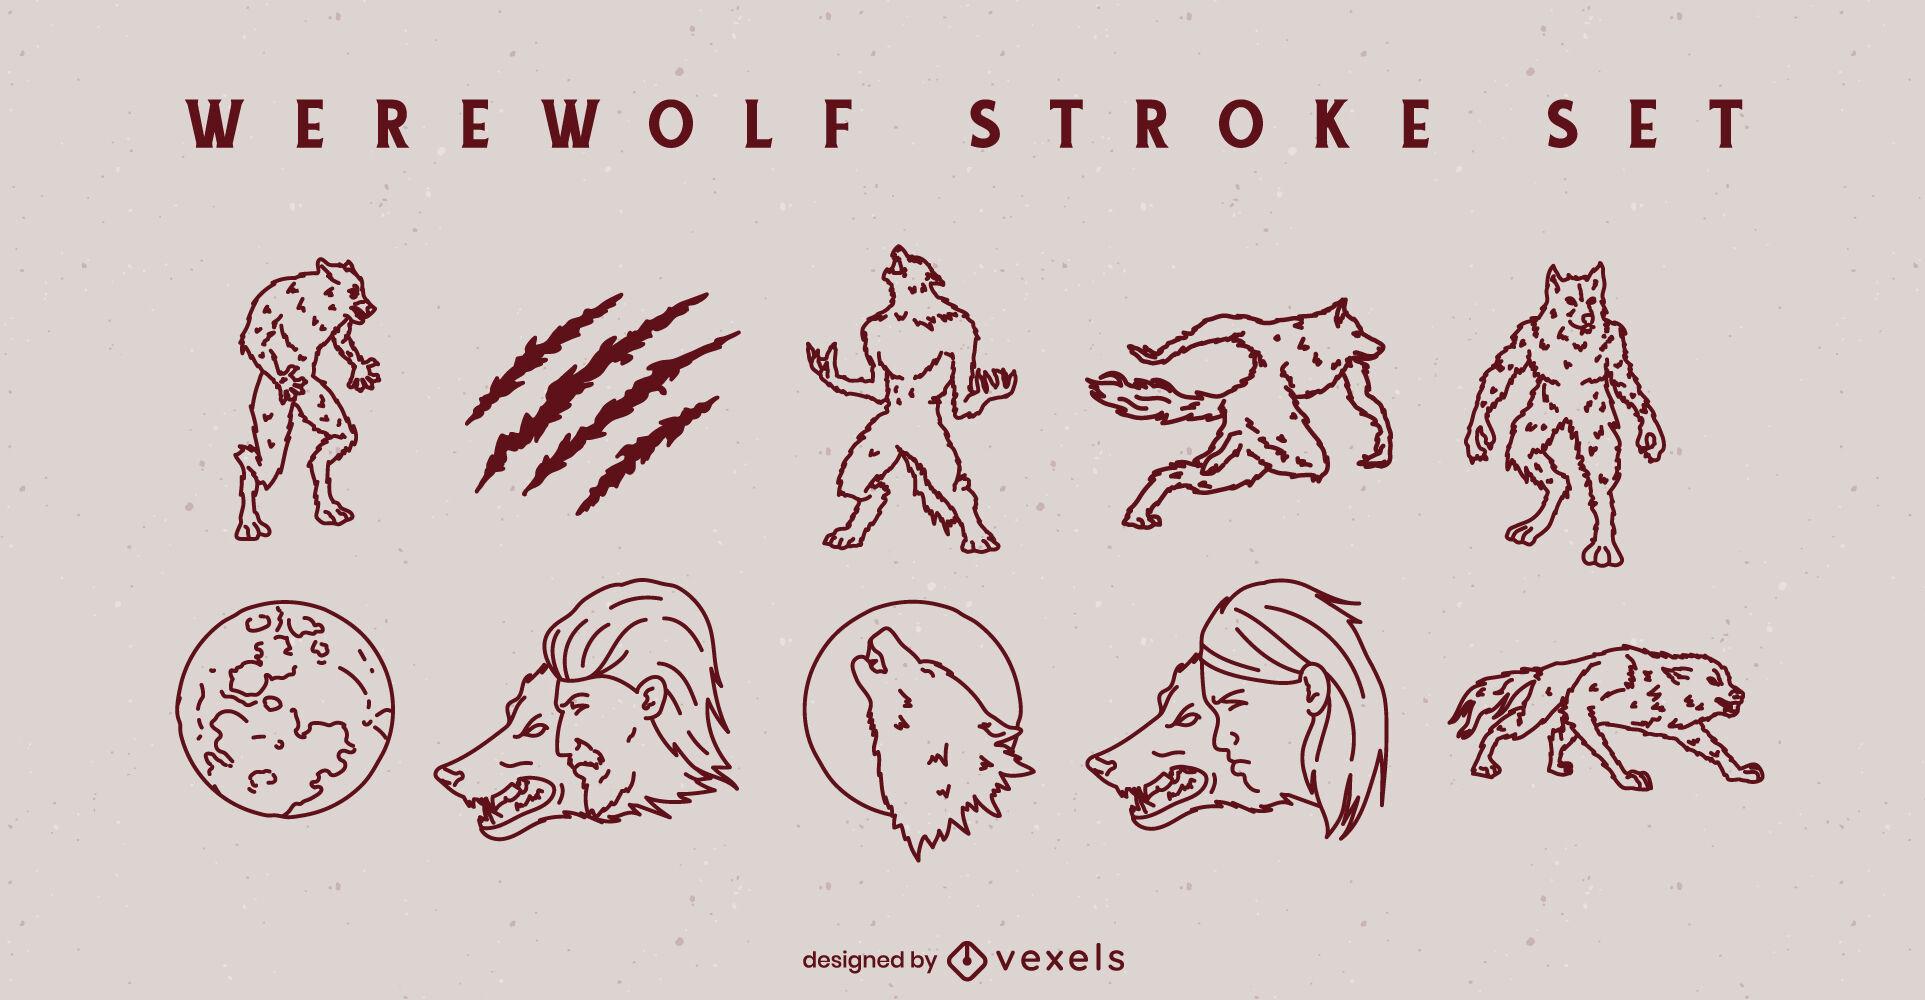 Werwolf-Monster-Charakter-Stroke-Set